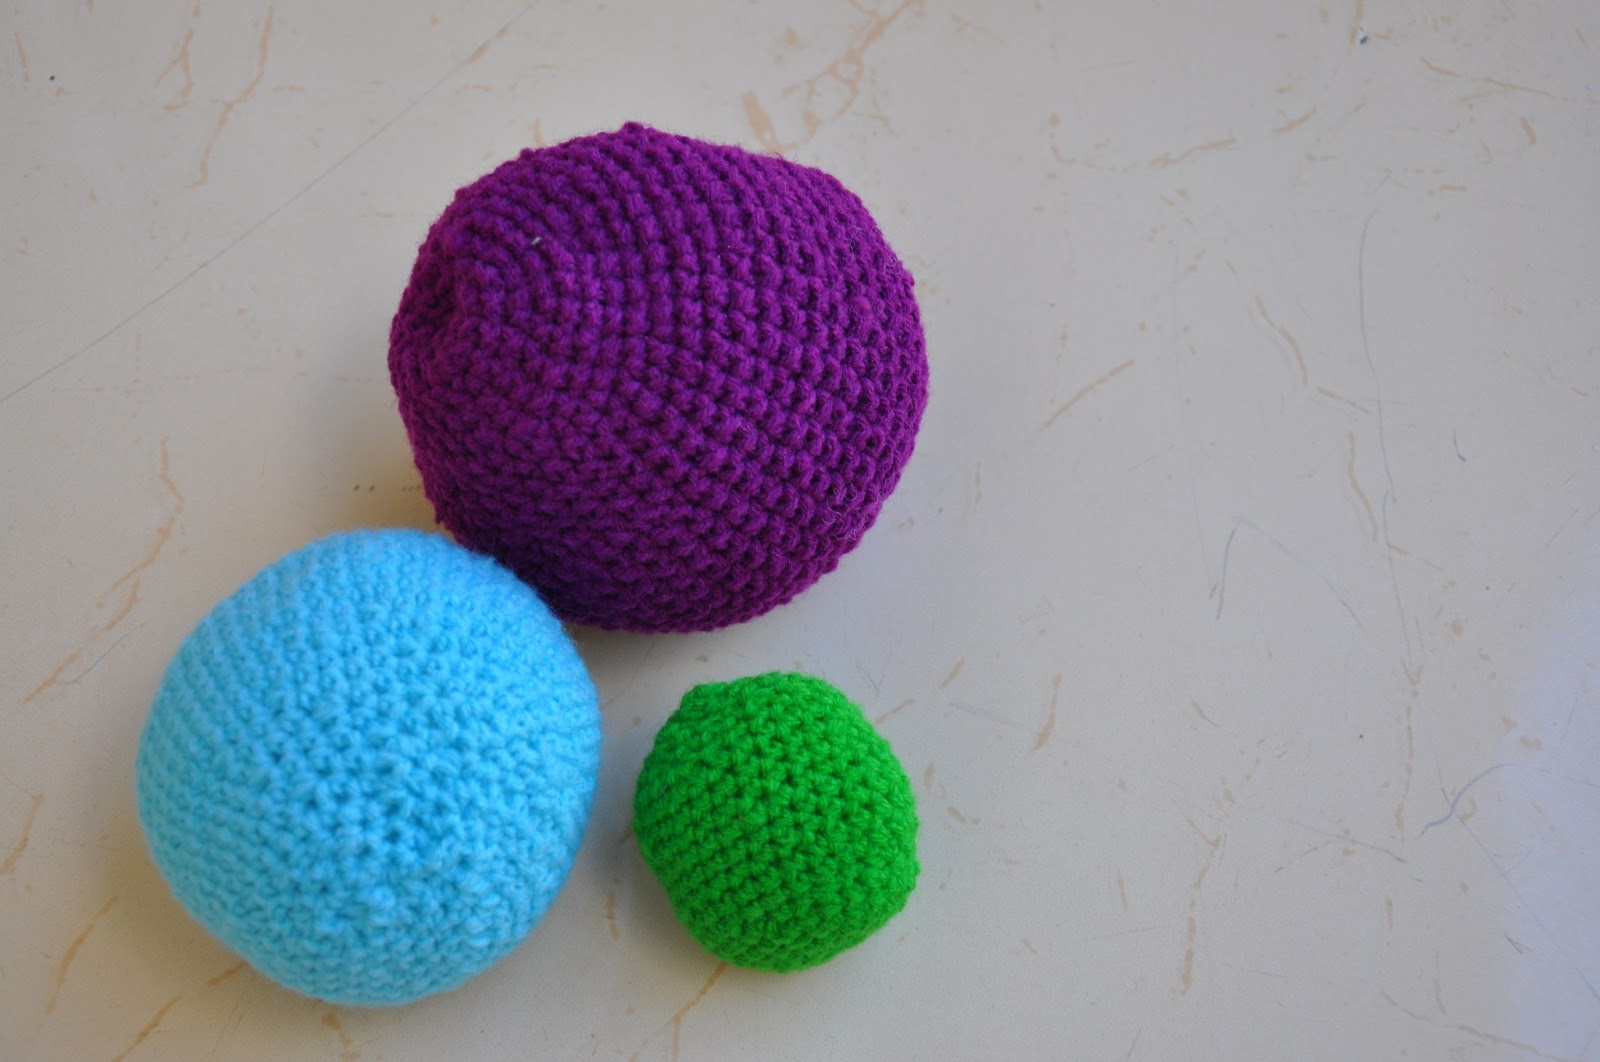 Crochet Amigurumi Small Ball : Sukrithaa: Amigurumi Crochet Balls